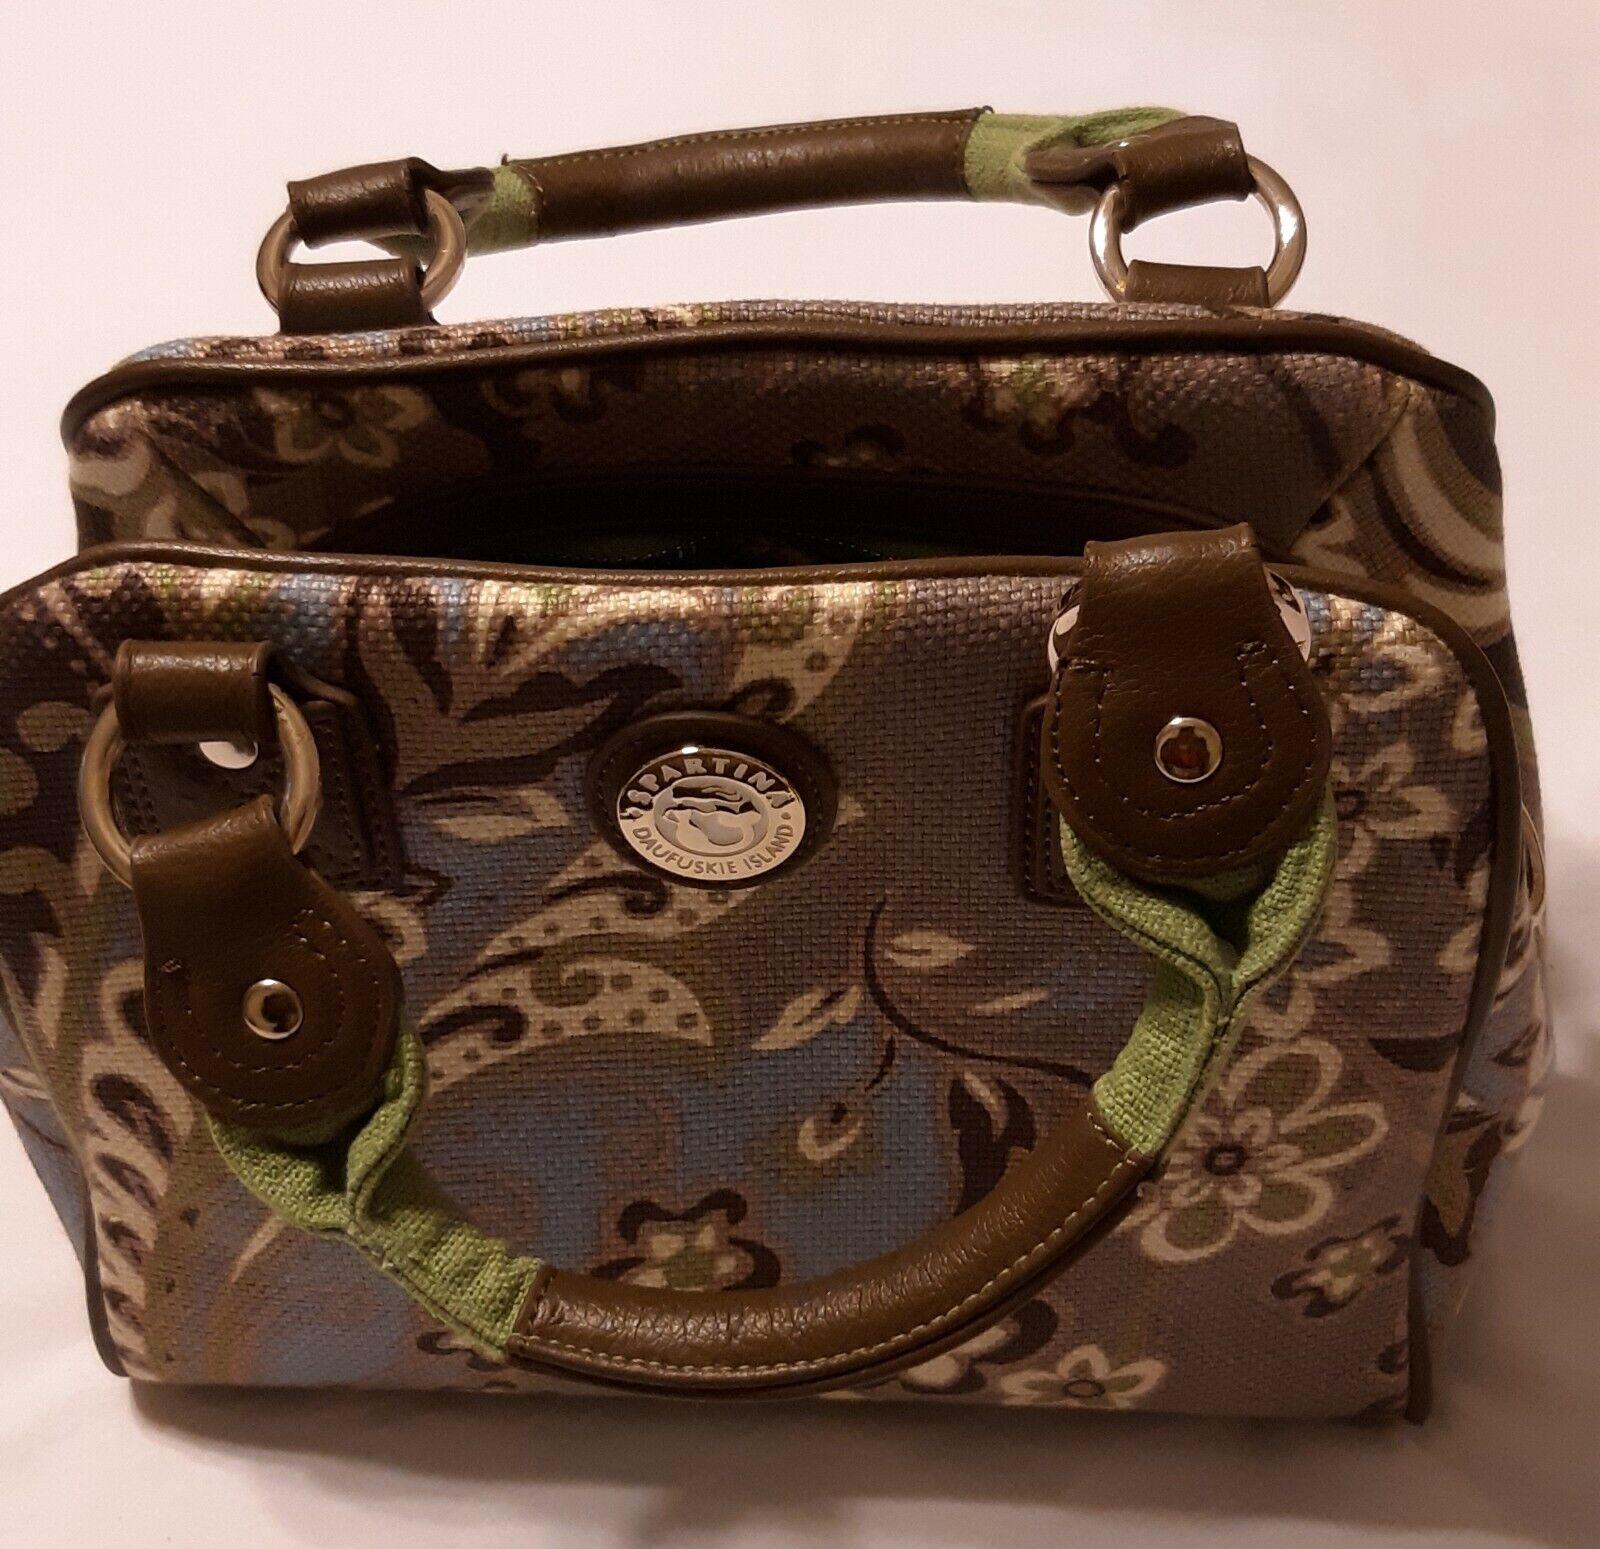 Spartina Daufuskie Handle Bag/Purse 449